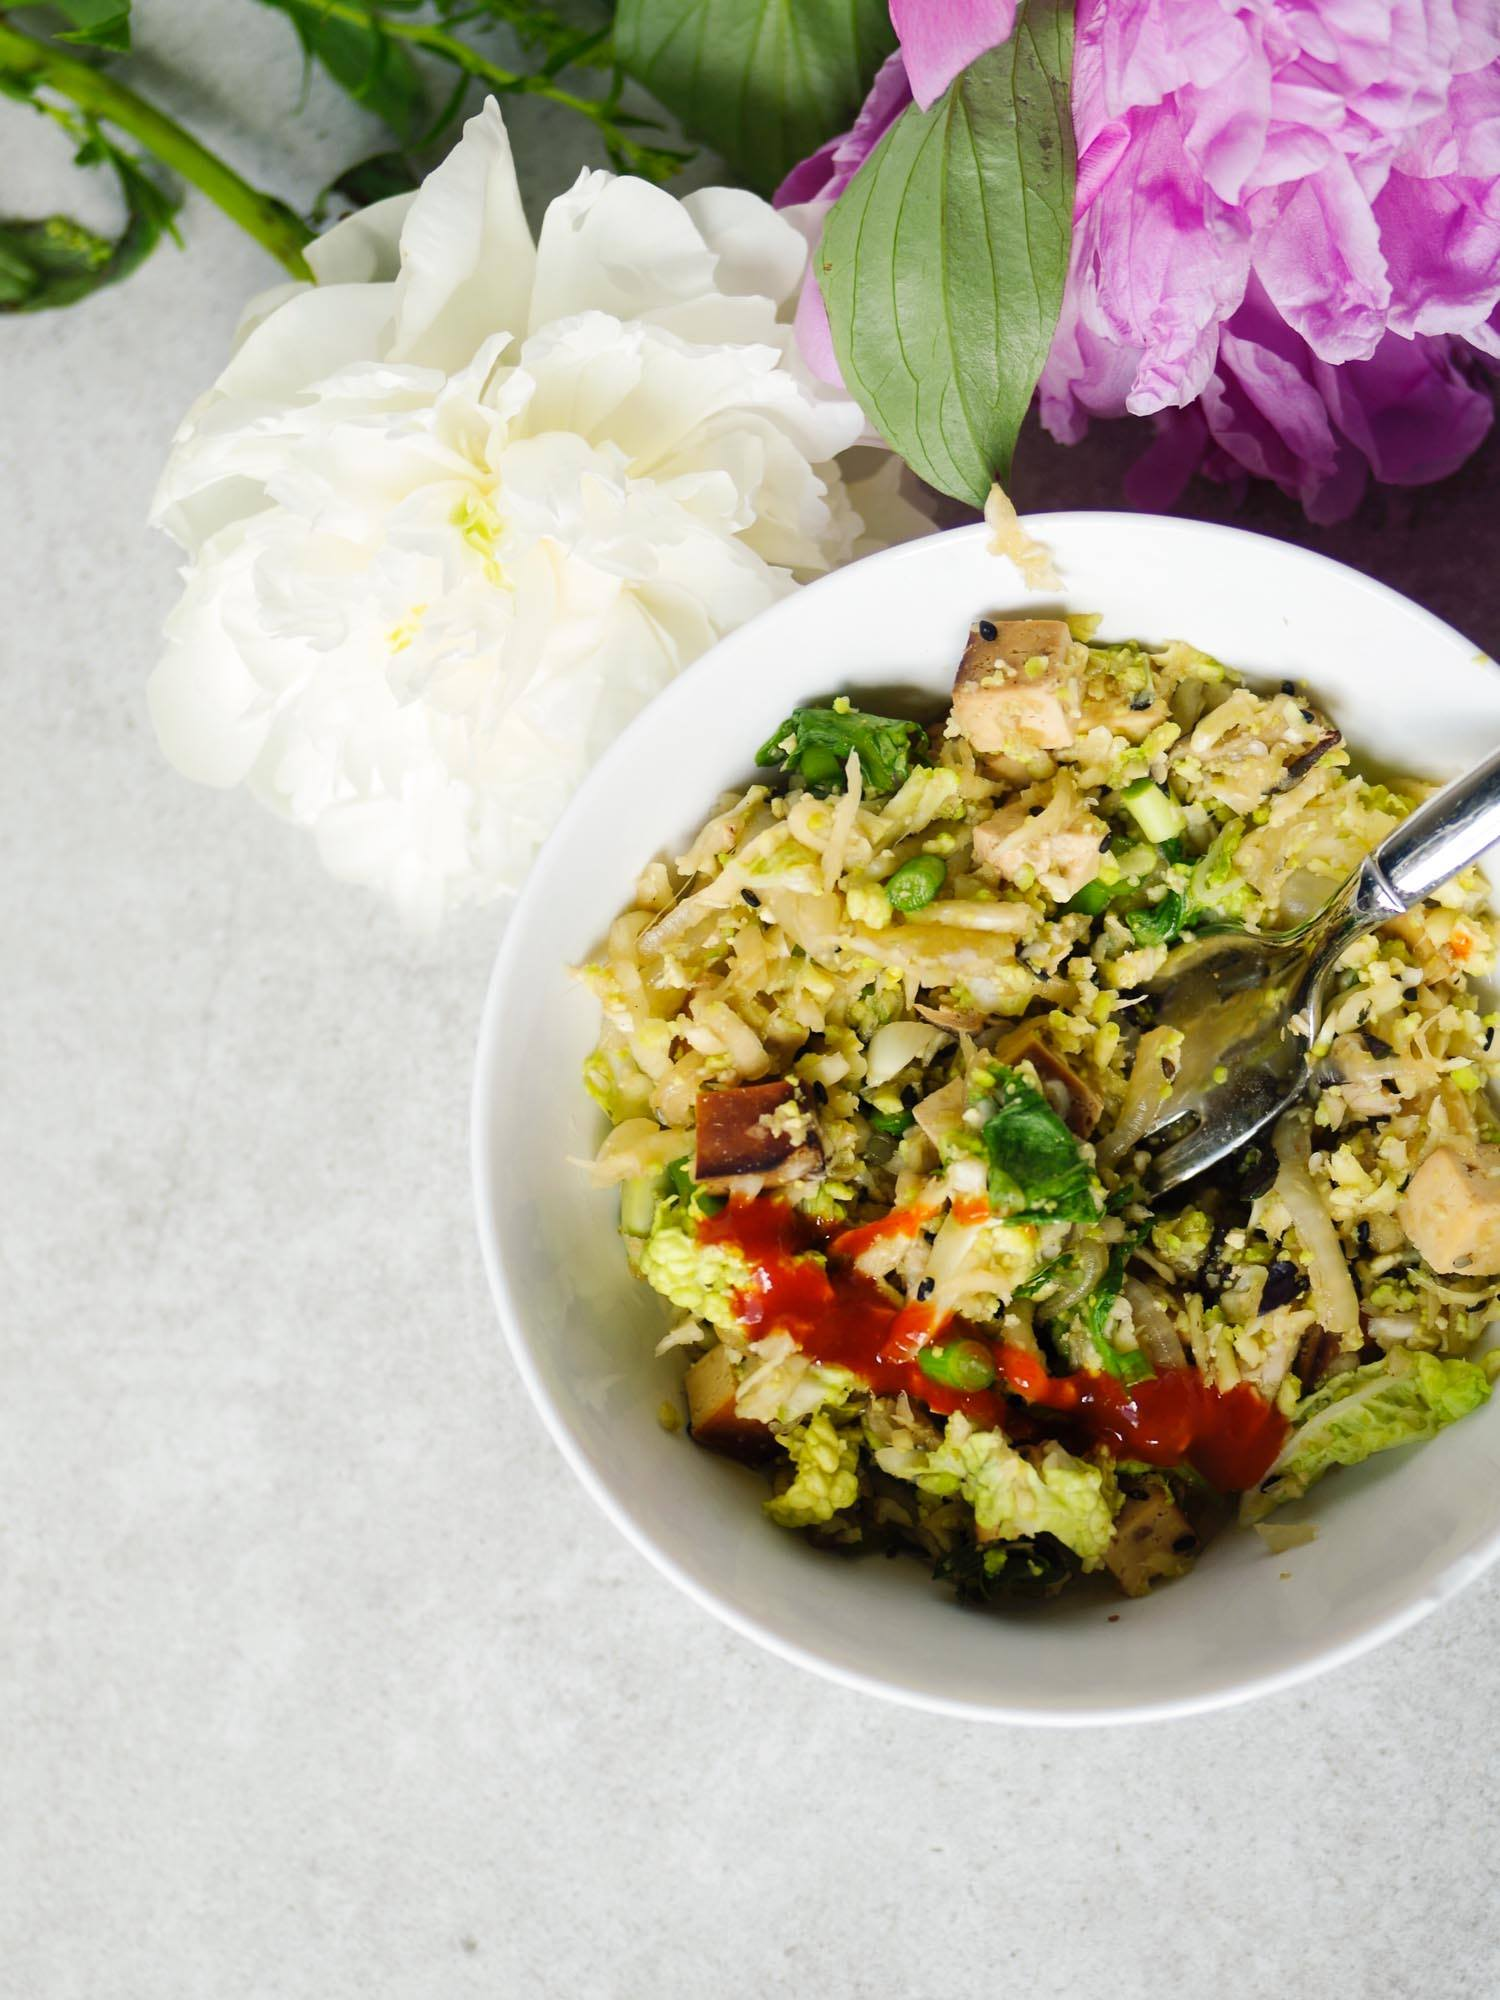 Cauliflower Fried Rice Made Oil-Free